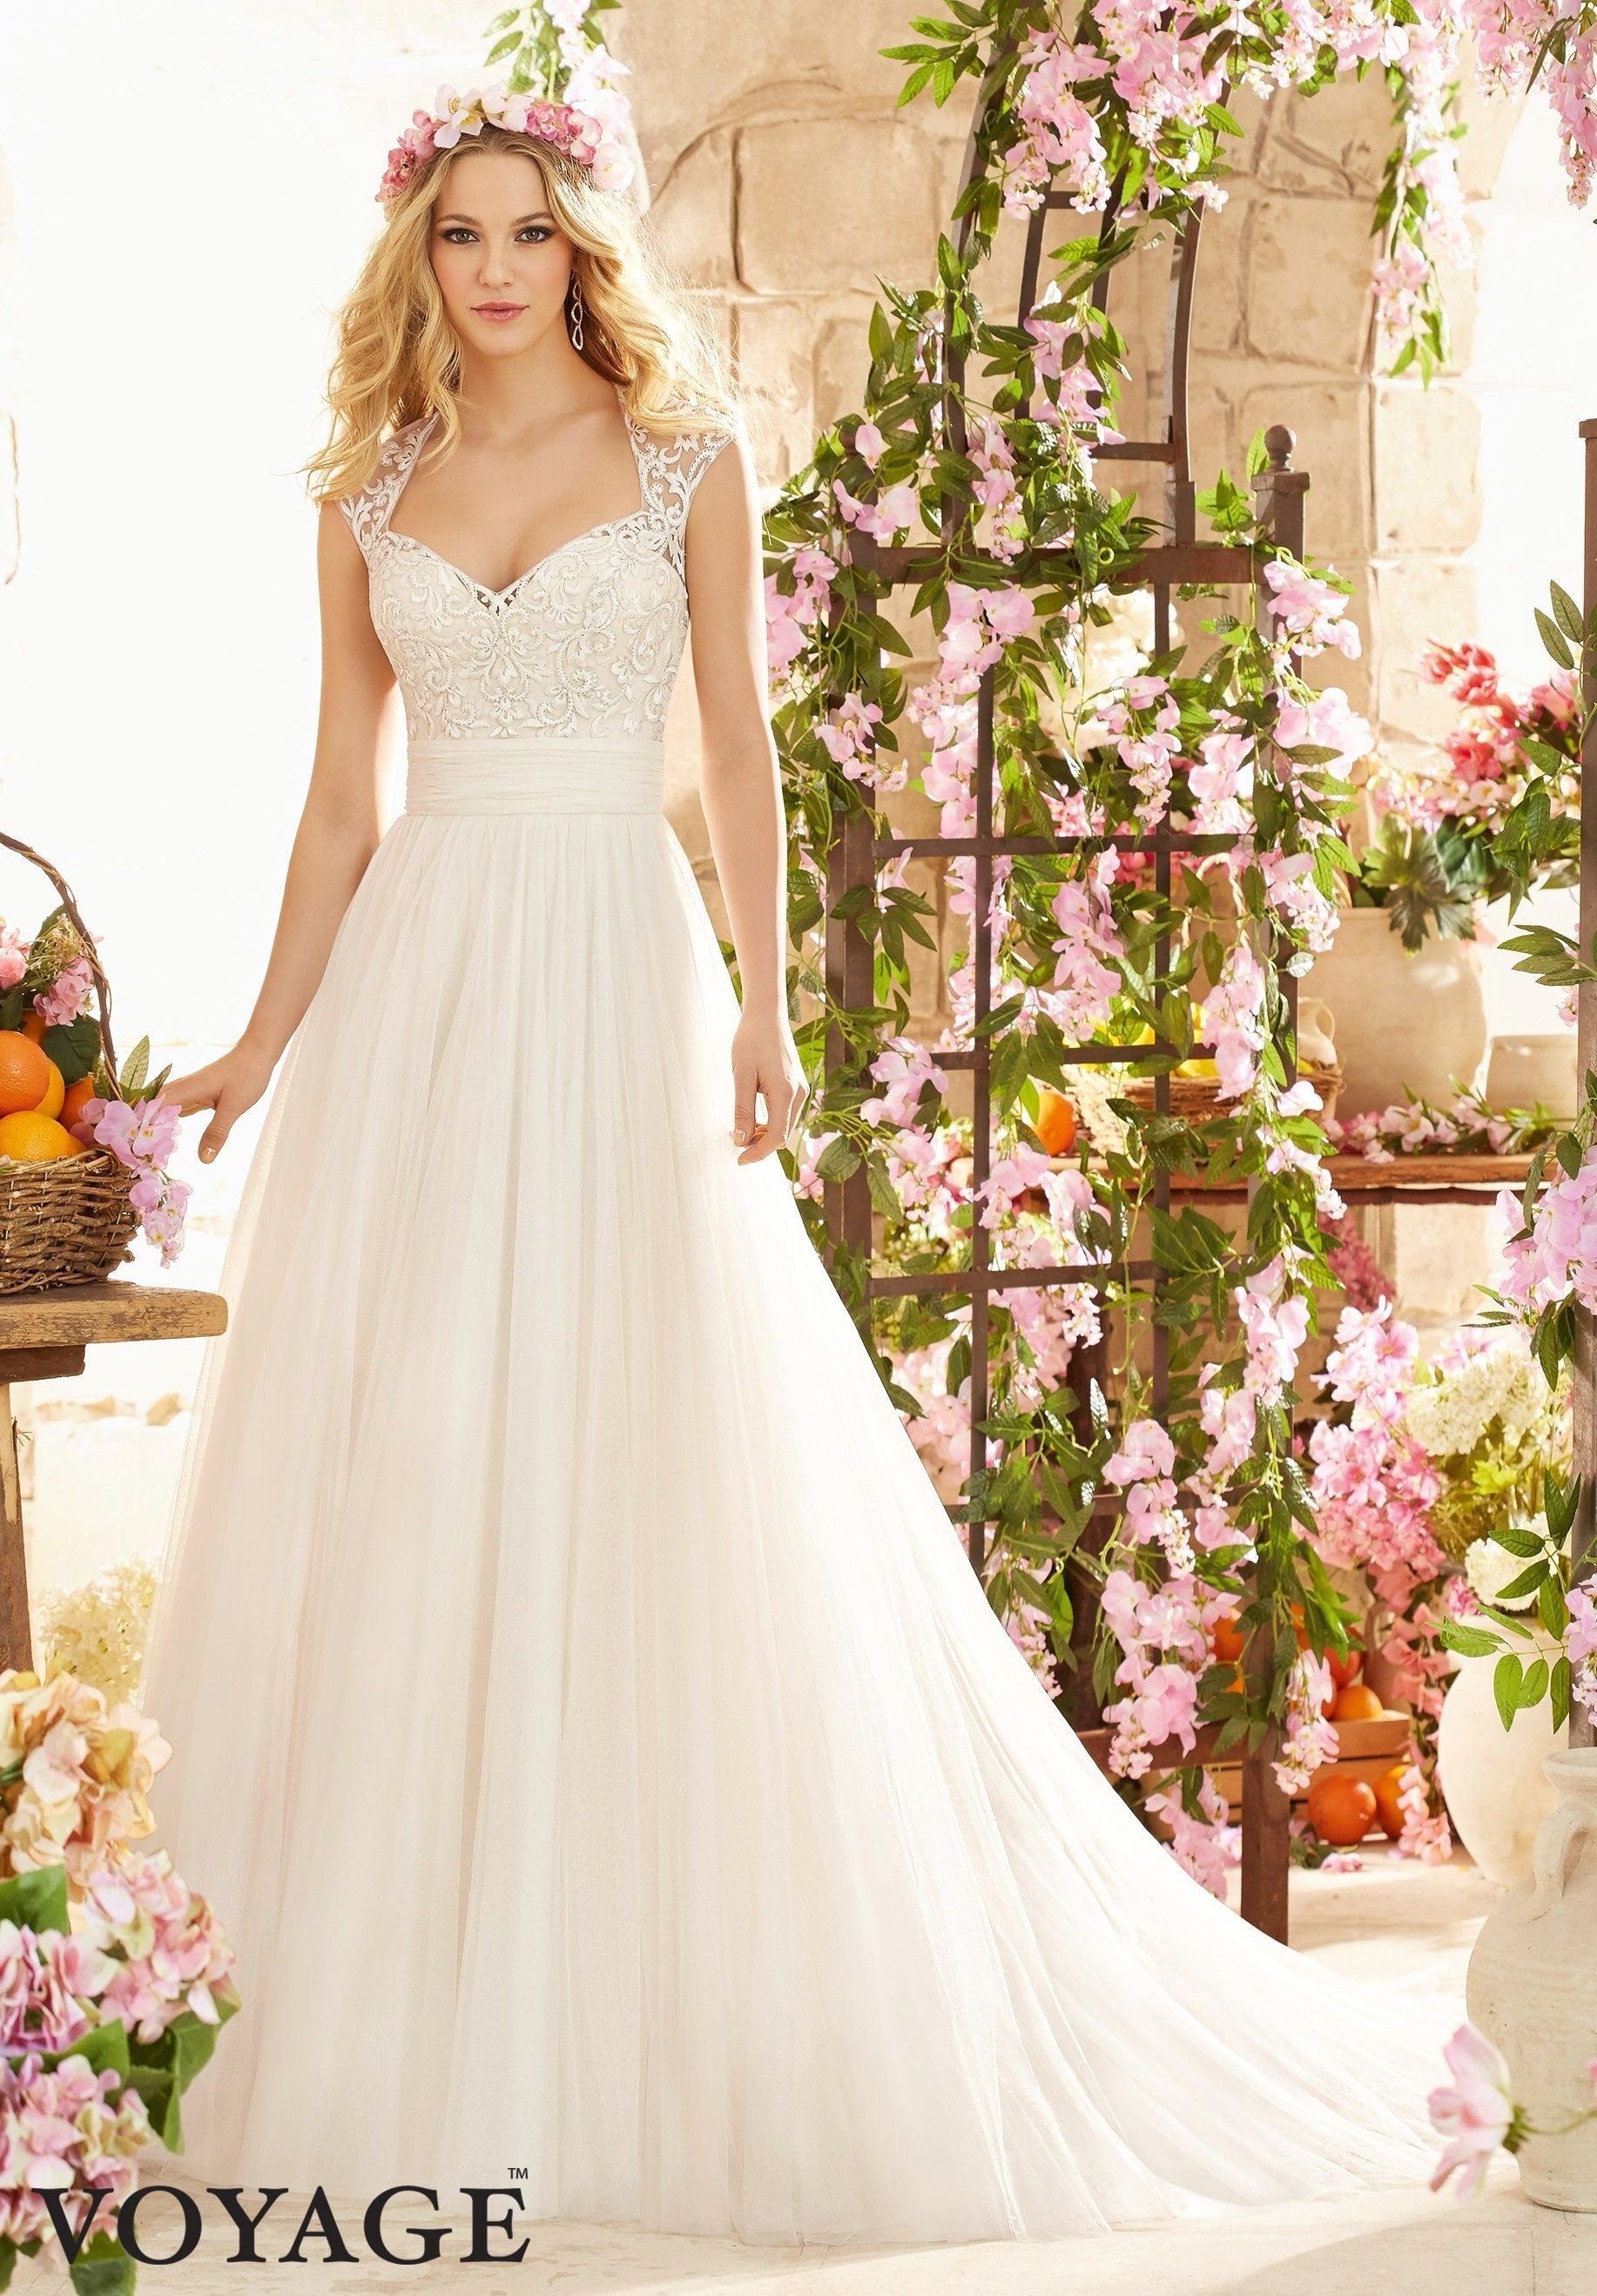 Mori Lee Voyage Wedding Dresses - Style 6803 [6803] - $679.00 ...